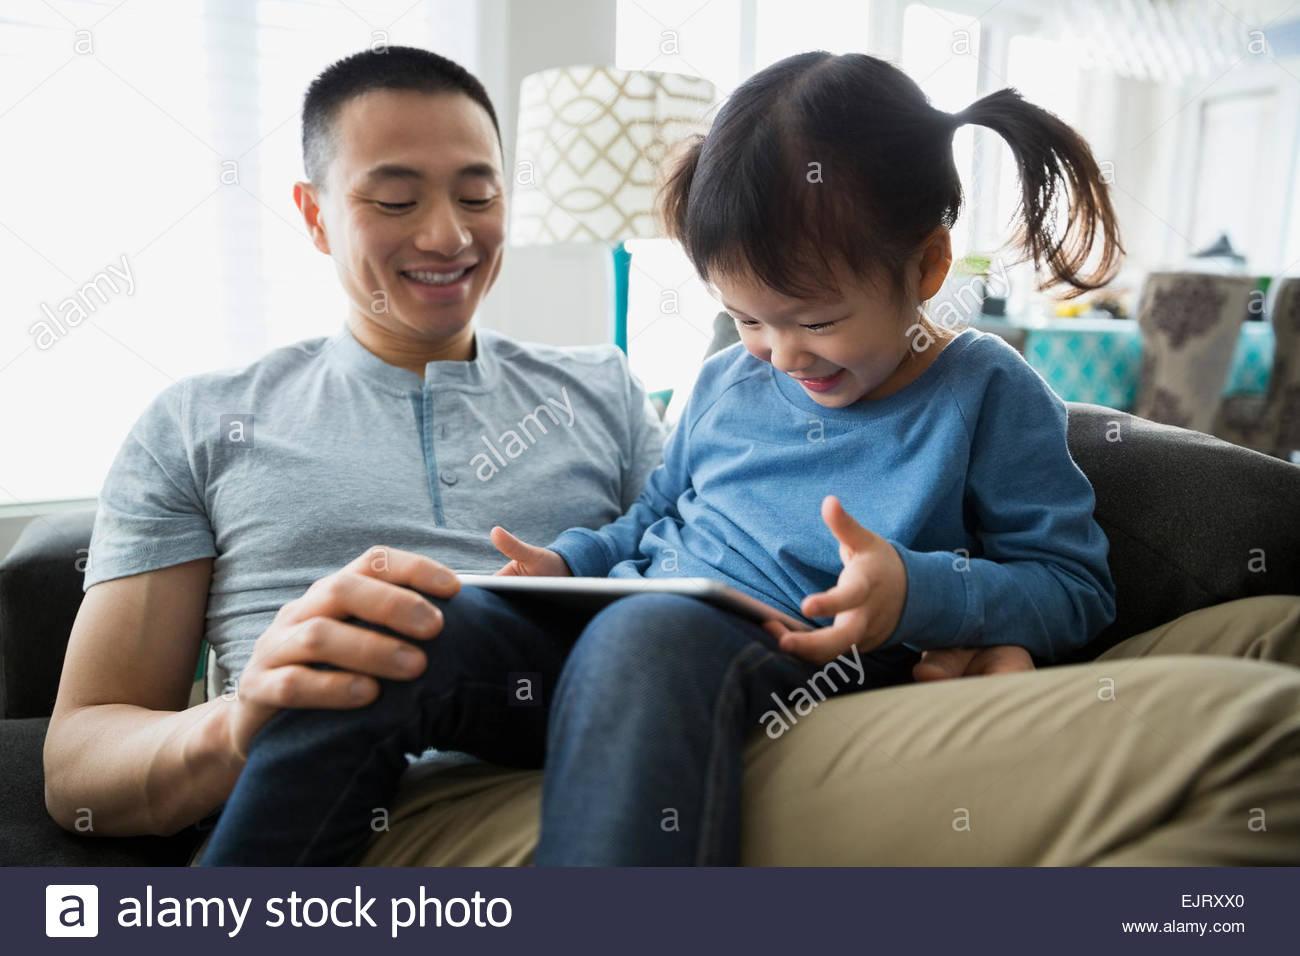 Padre e hija mediante tableta digital Imagen De Stock